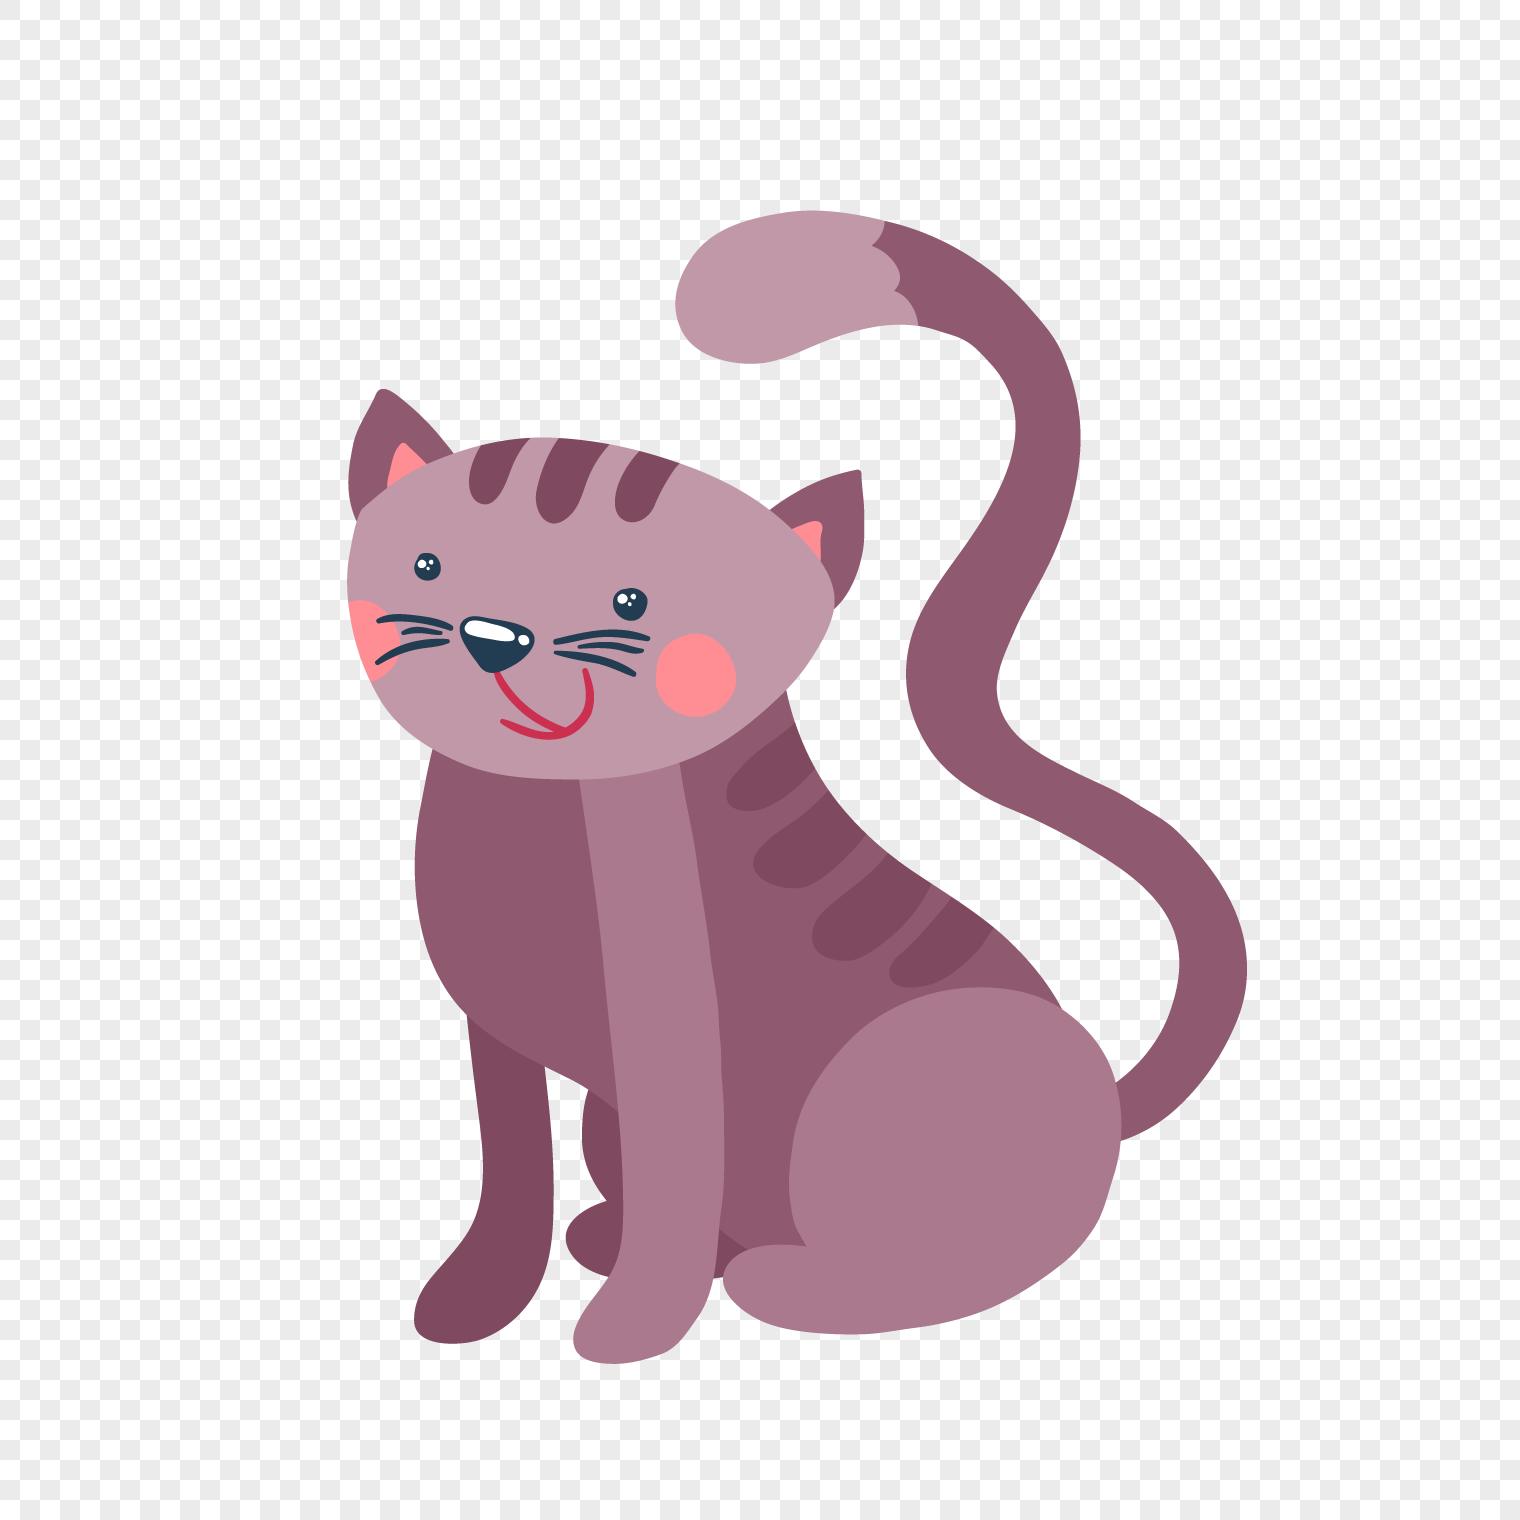 Cartoon Gambar Kucing Kartun Wwwtollebildcom